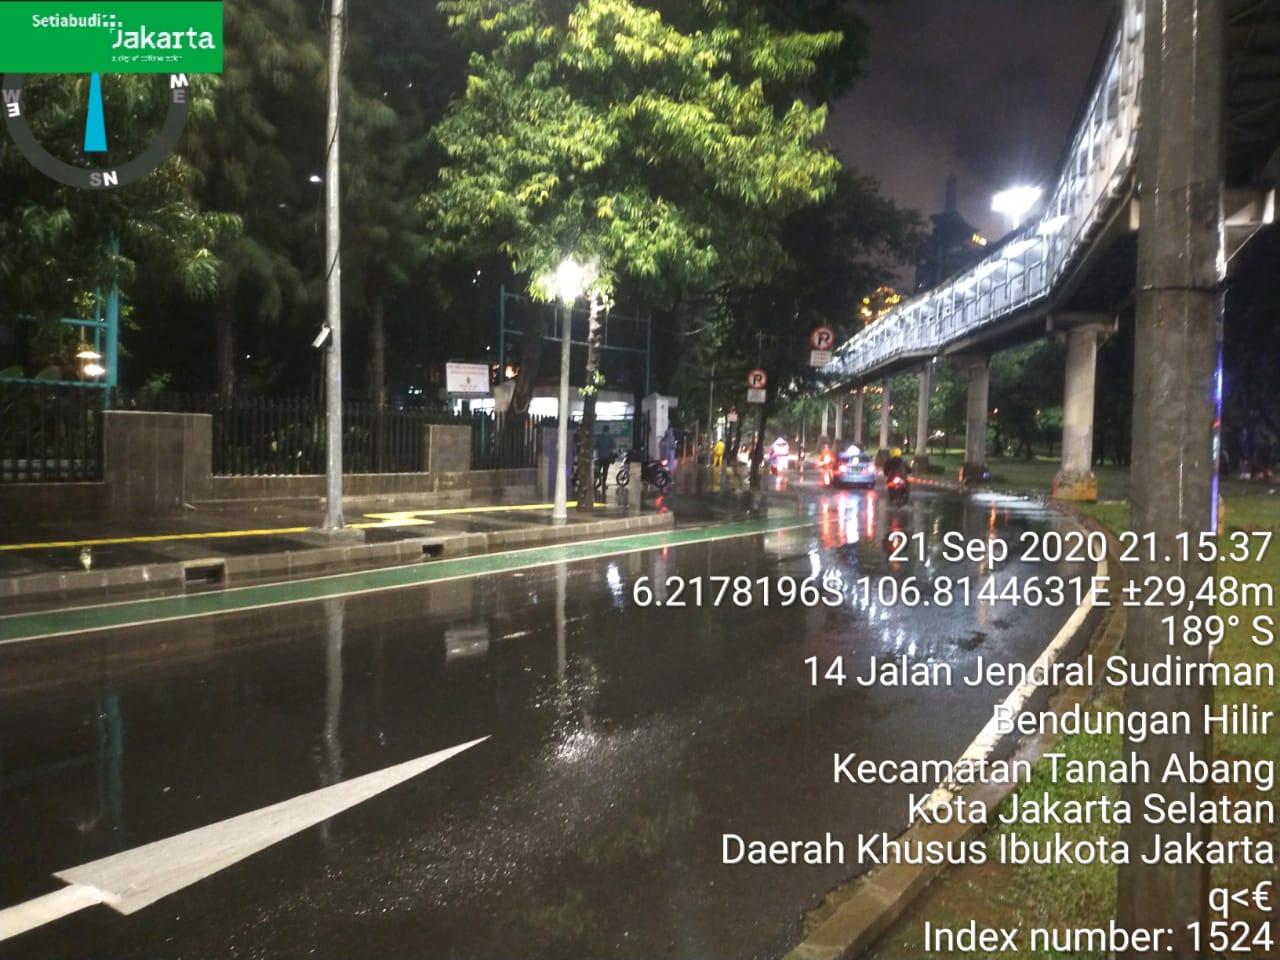 Malam Jakarta Banjir, Paginya Langsung Surut